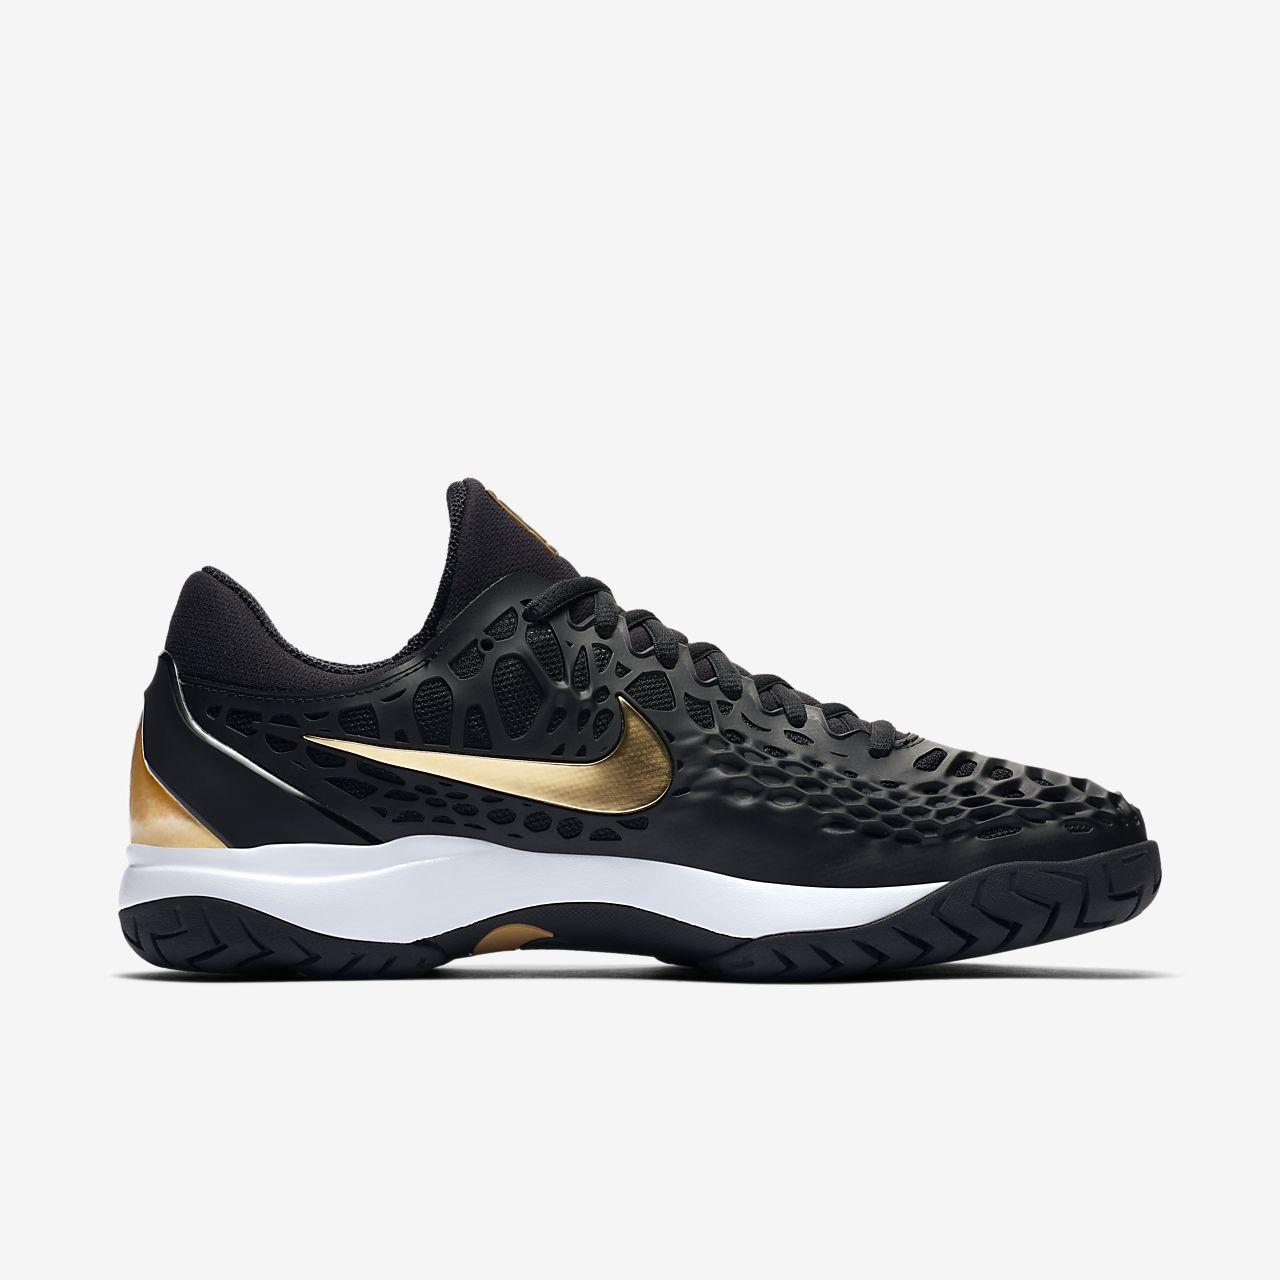 NikeCourt Zoom Cage 3 Men's Hard Court Tennis Shoe